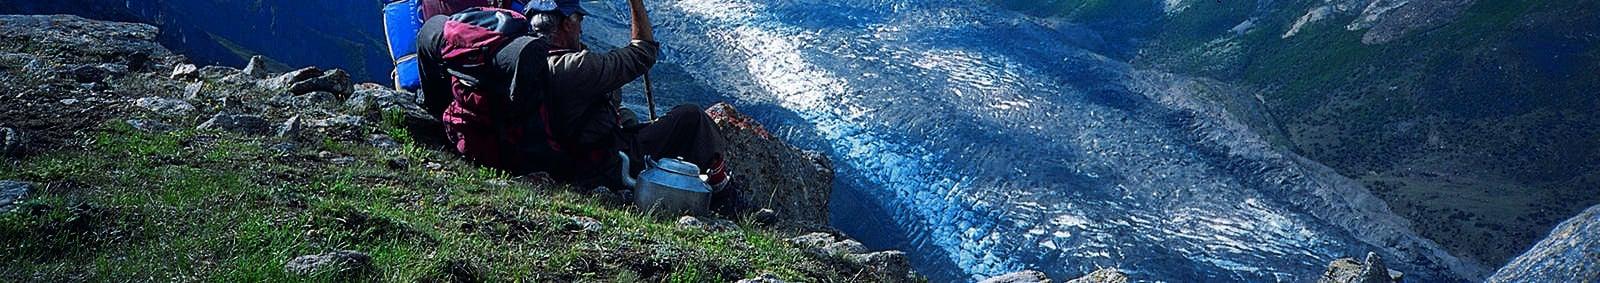 Trekker and porter resting during climb to Rash Lake